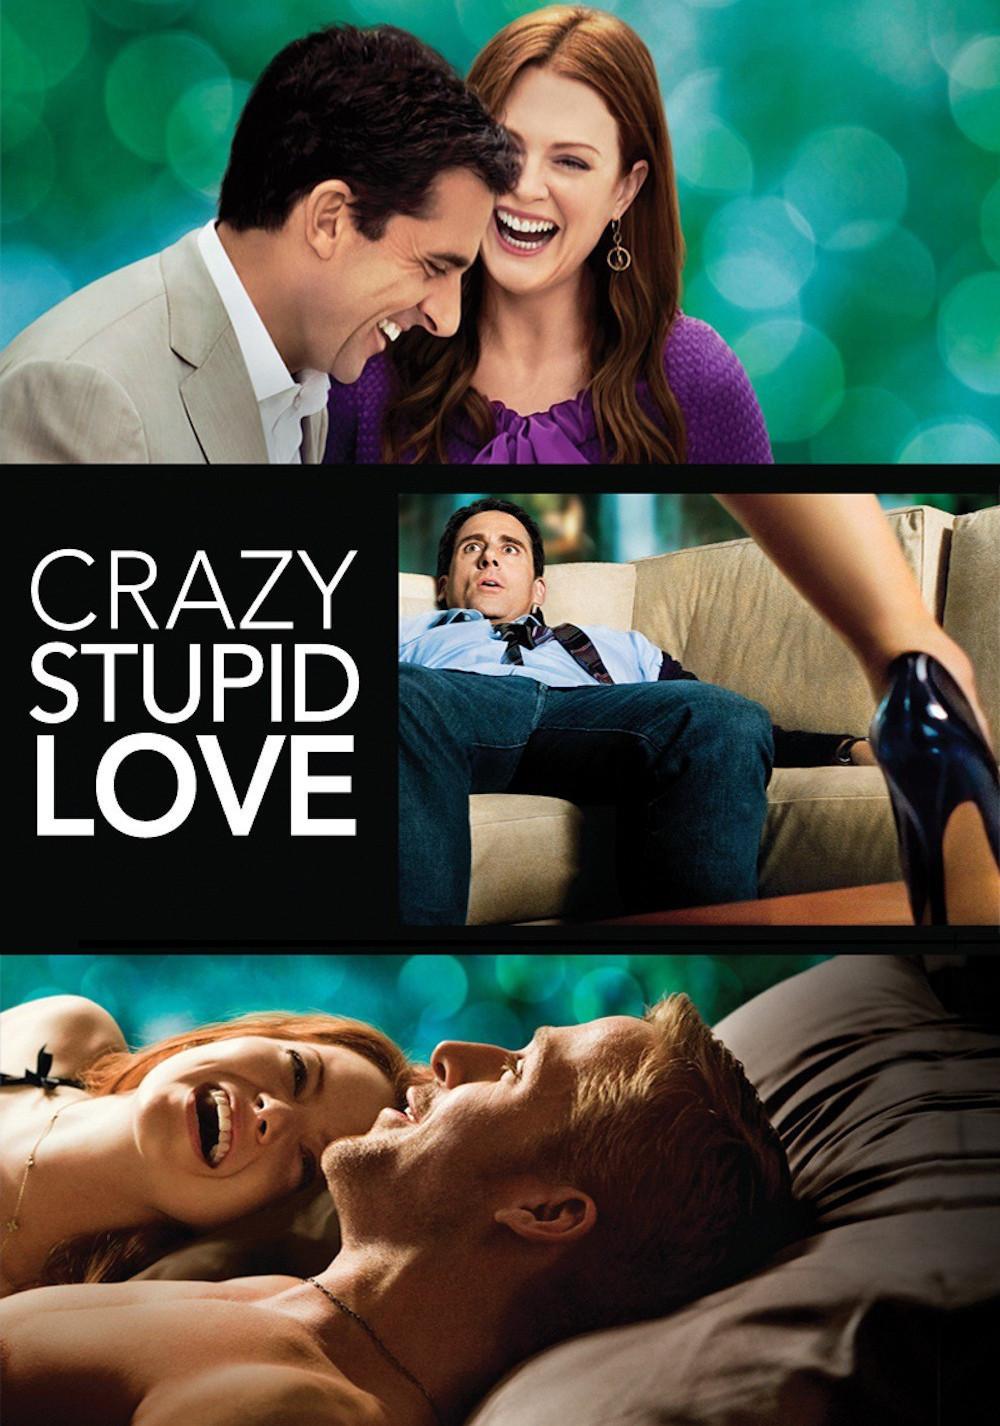 crazy-stupid-love-52ec435968557